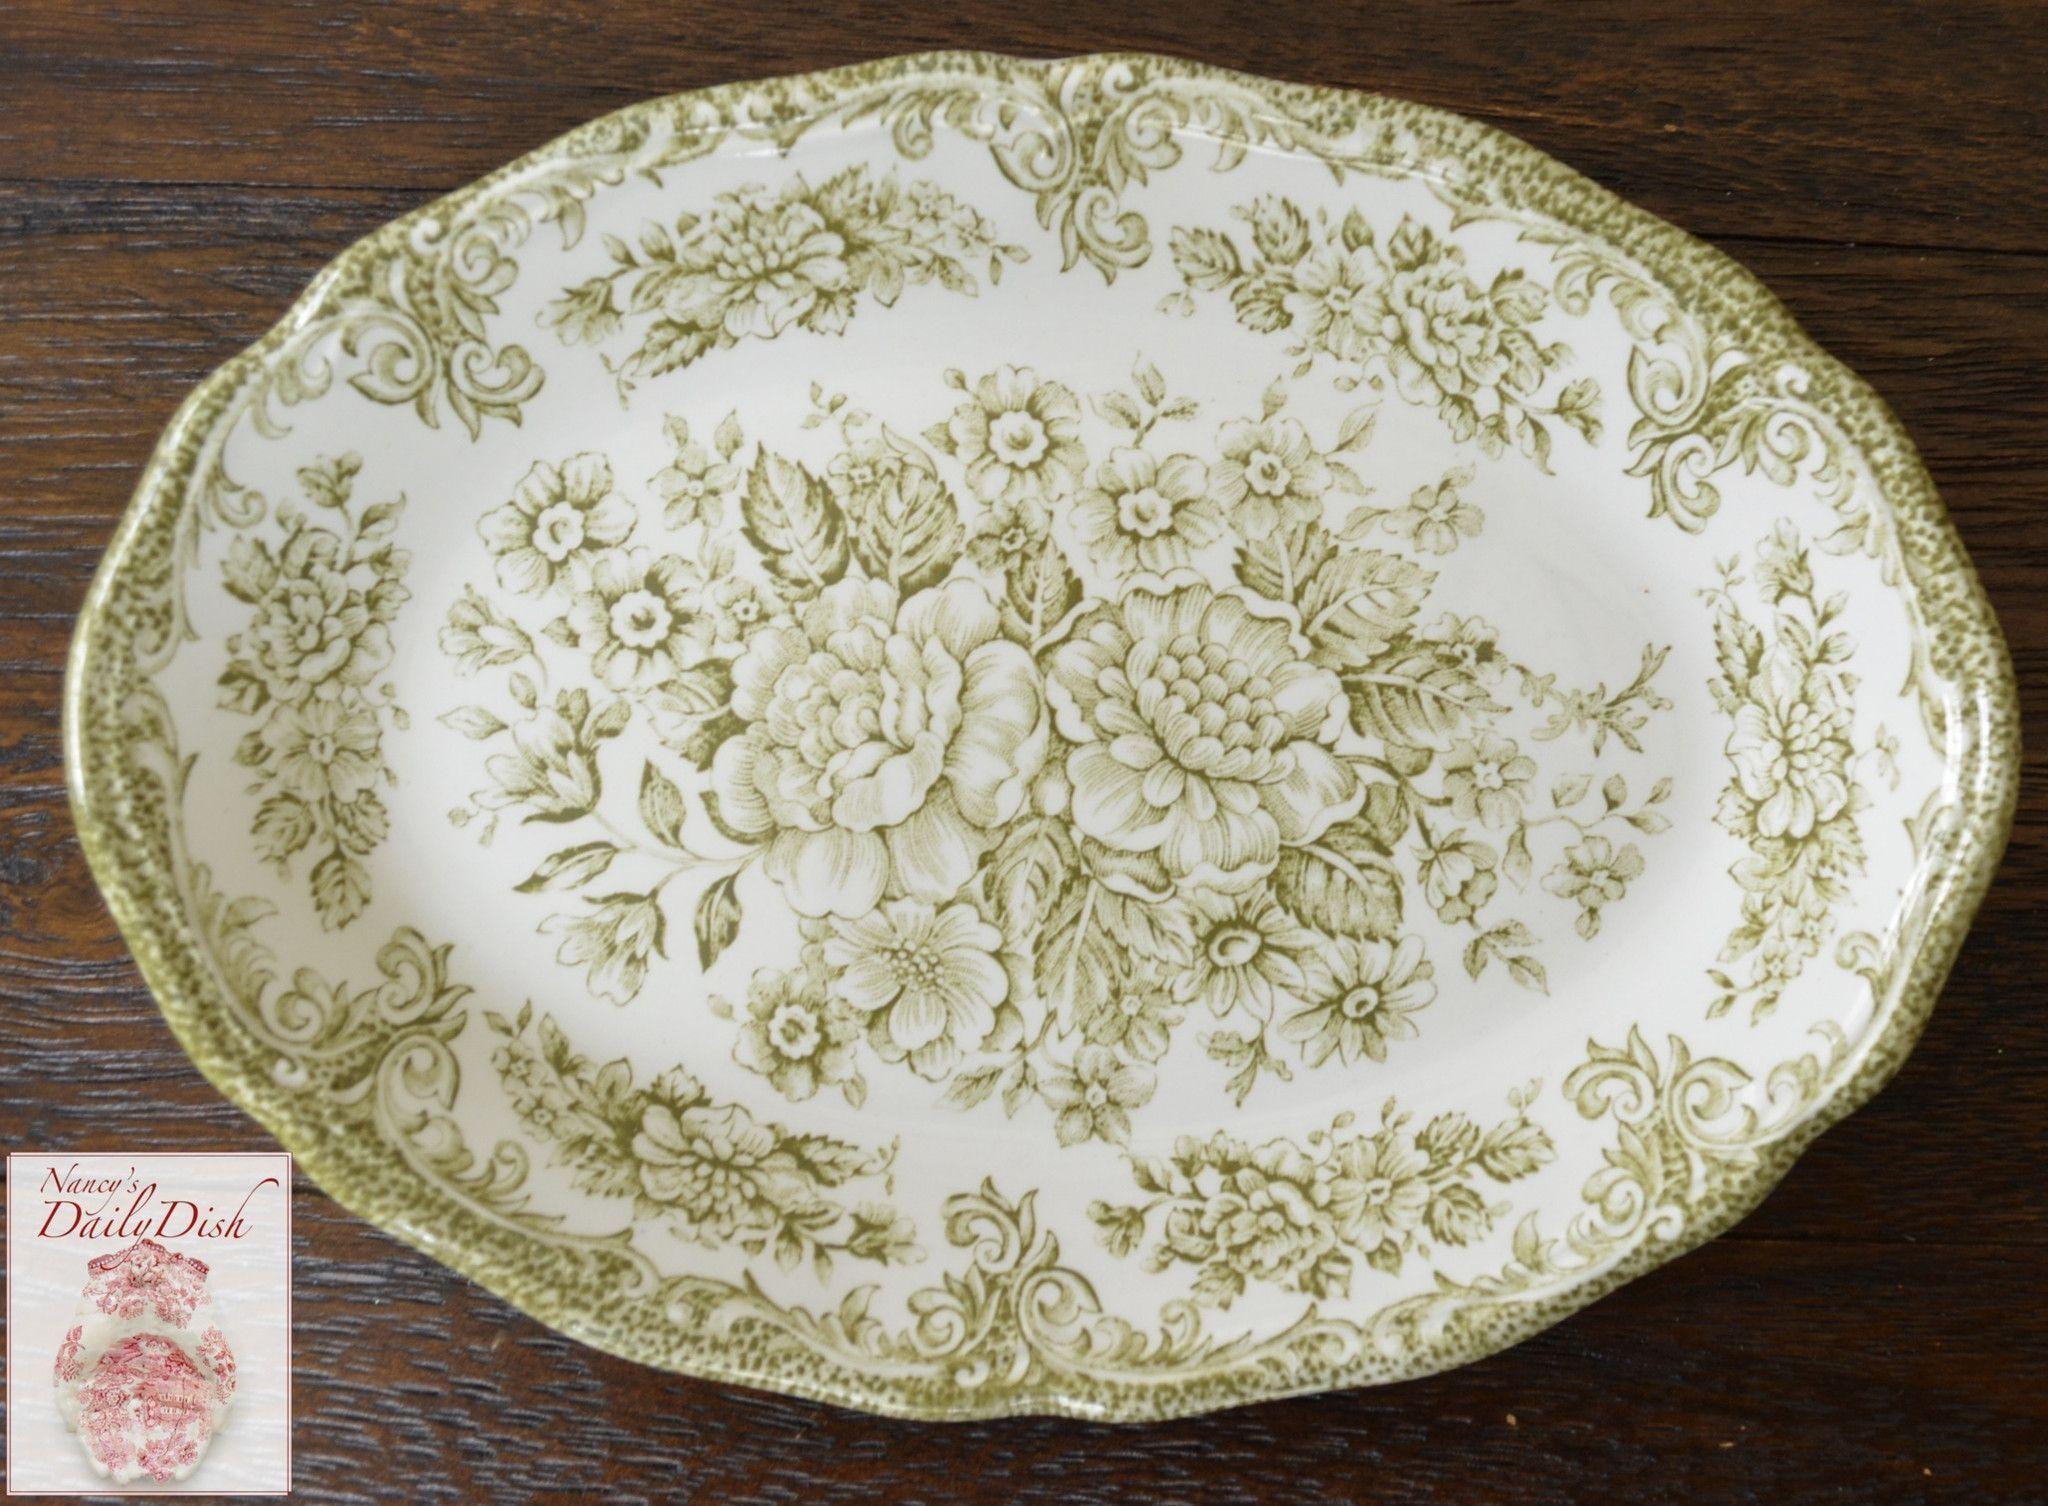 Vintage Sage / Olive Green Transferware Relish Tray Small Platter Rose